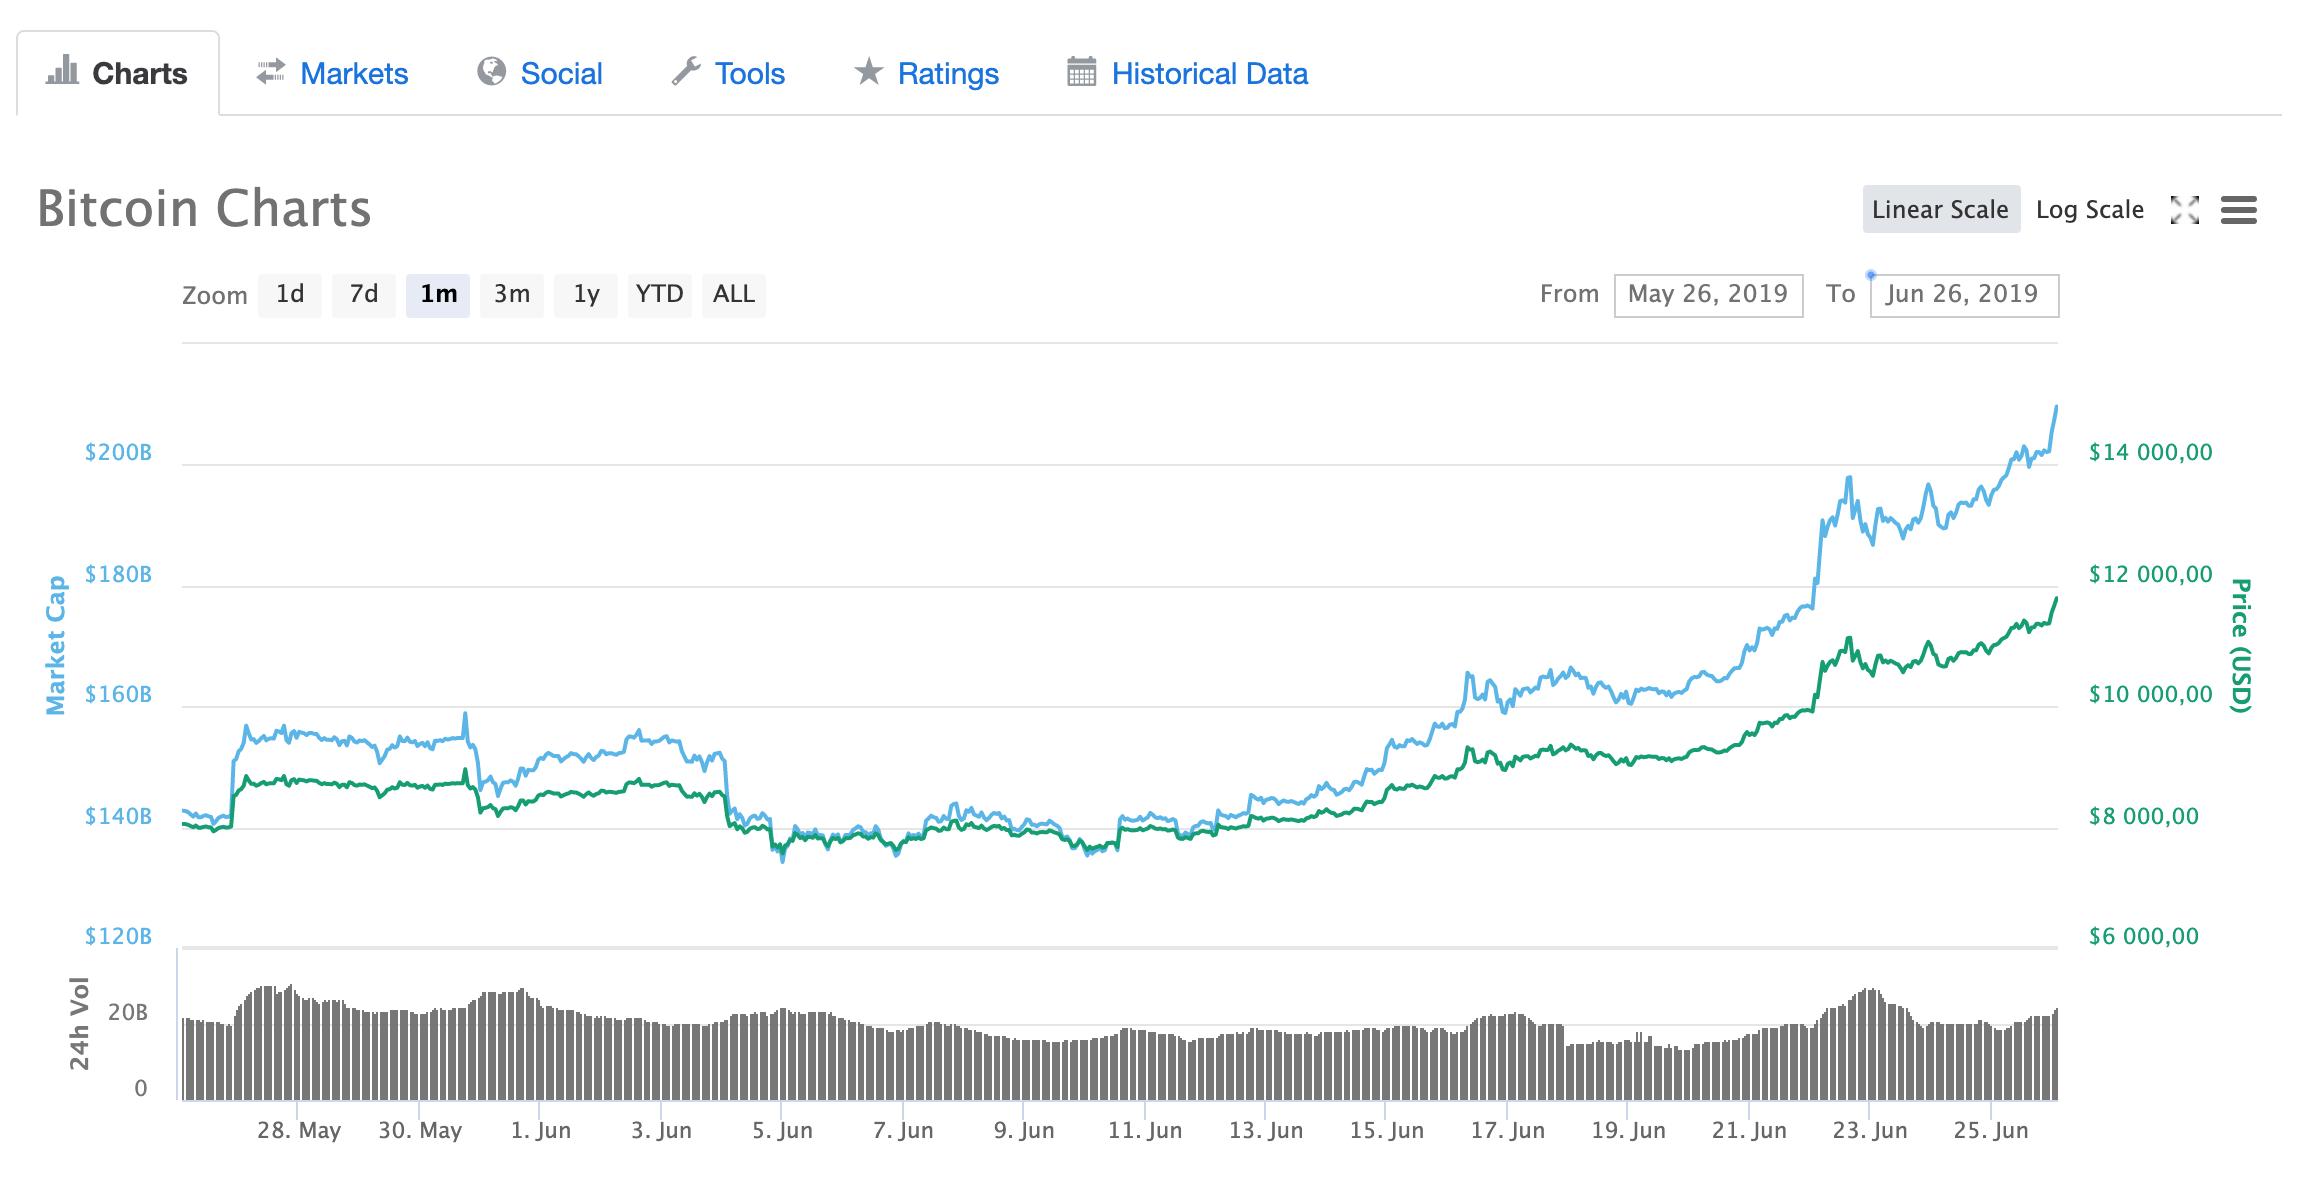 Bitcoin flash crash: BTC traci niemal 2 tys. USD w 15 minut. Winna Coinbase?